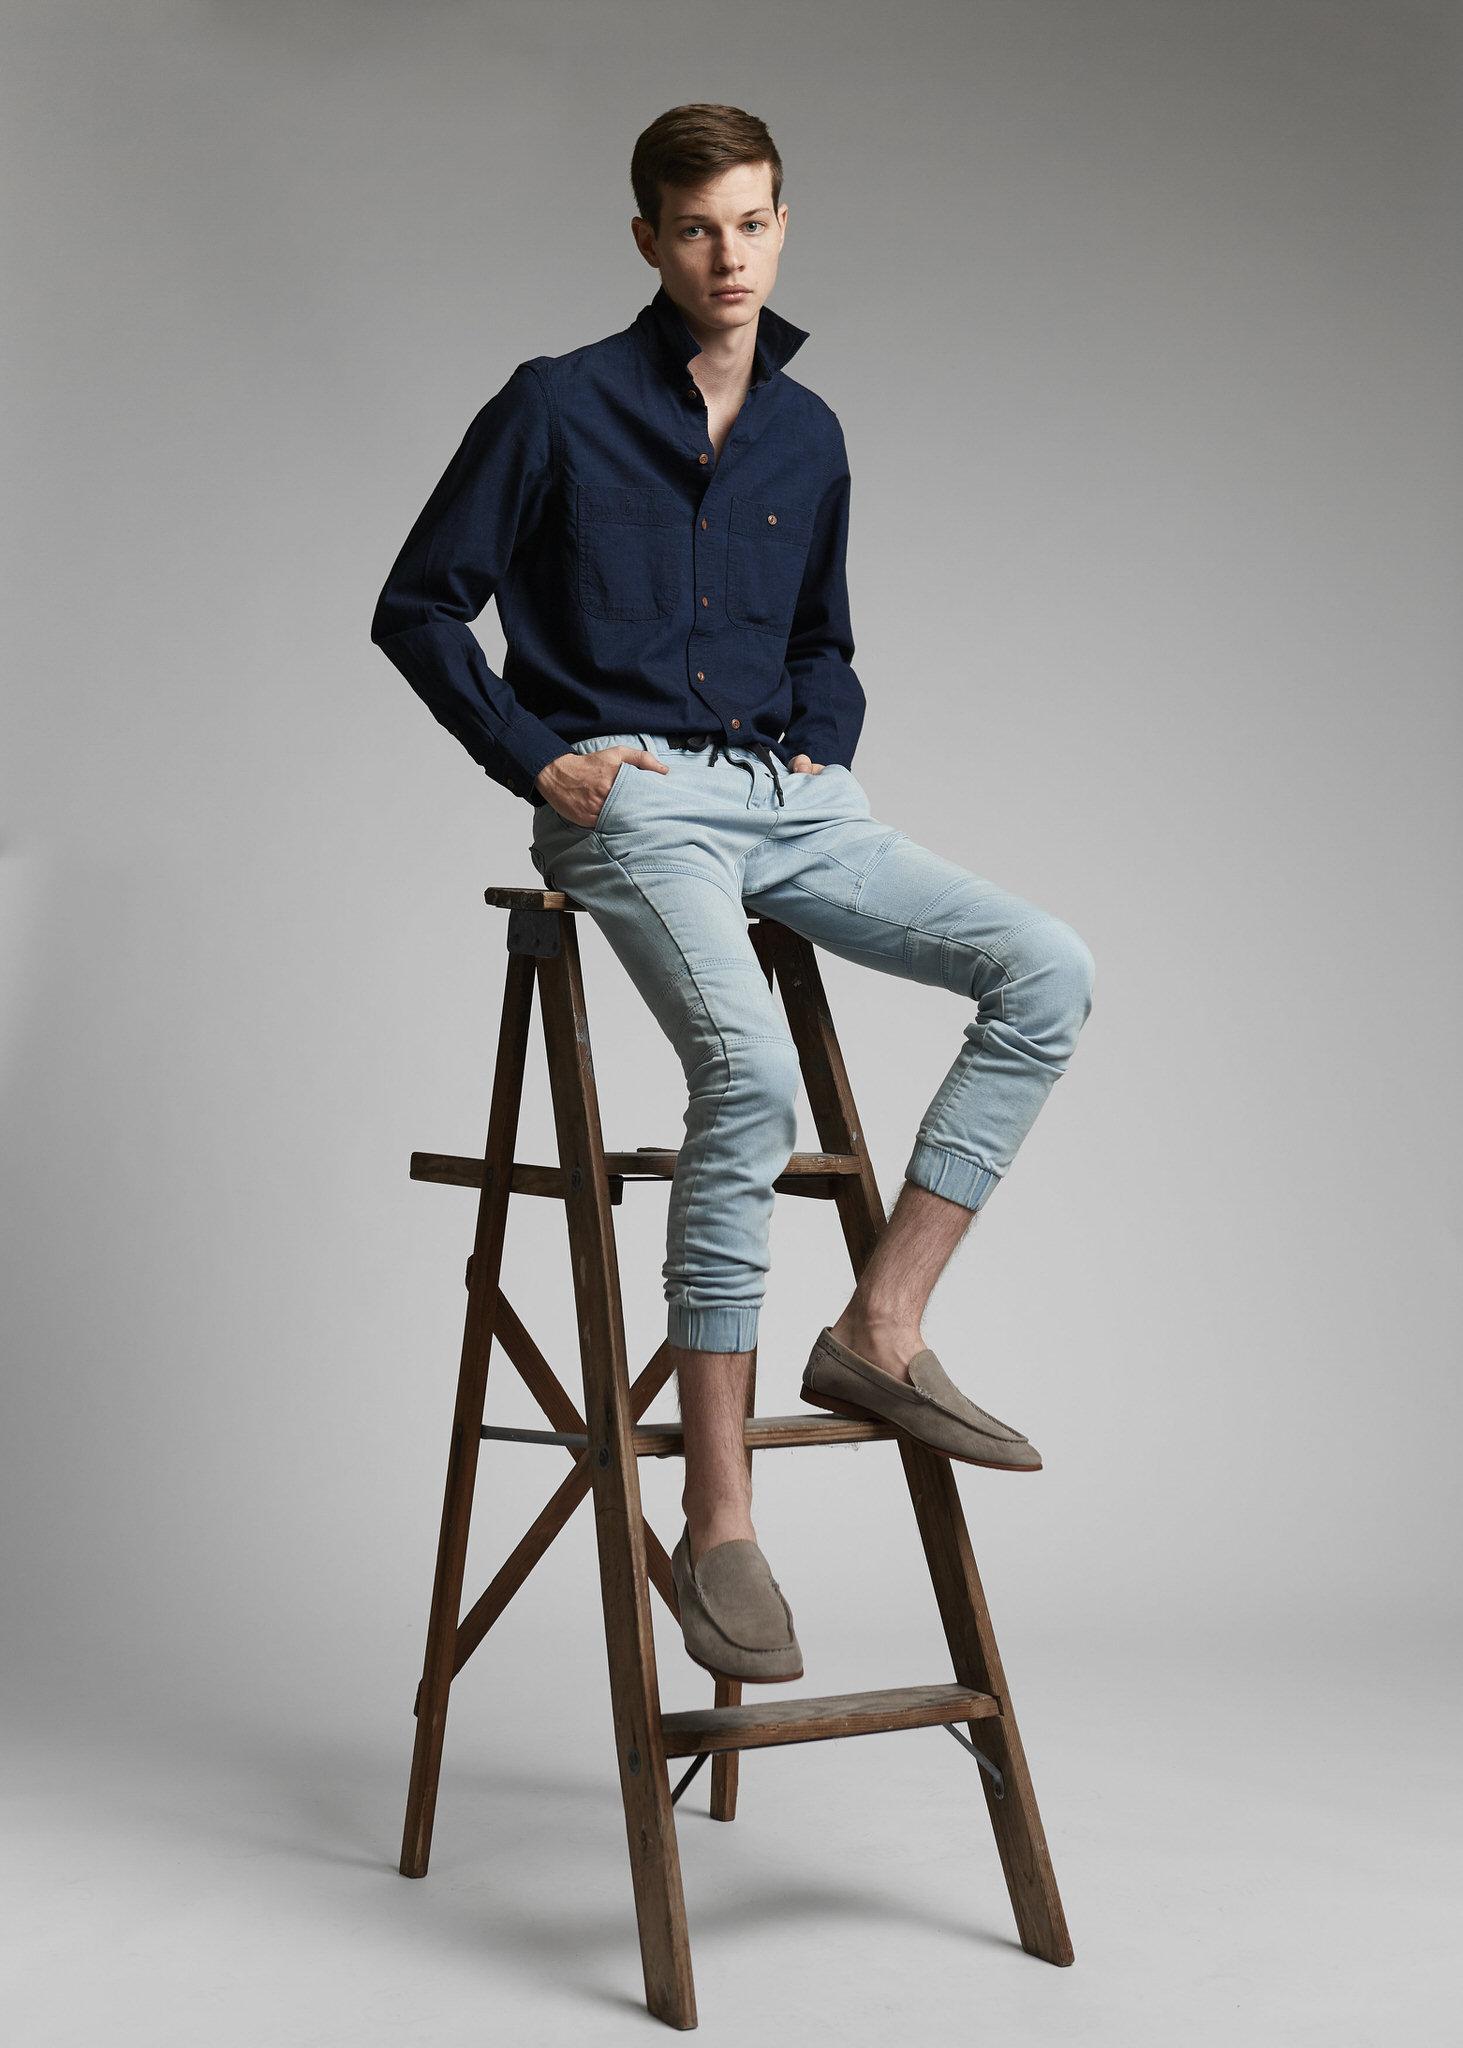 hunter-fashion-model-studio.jpg